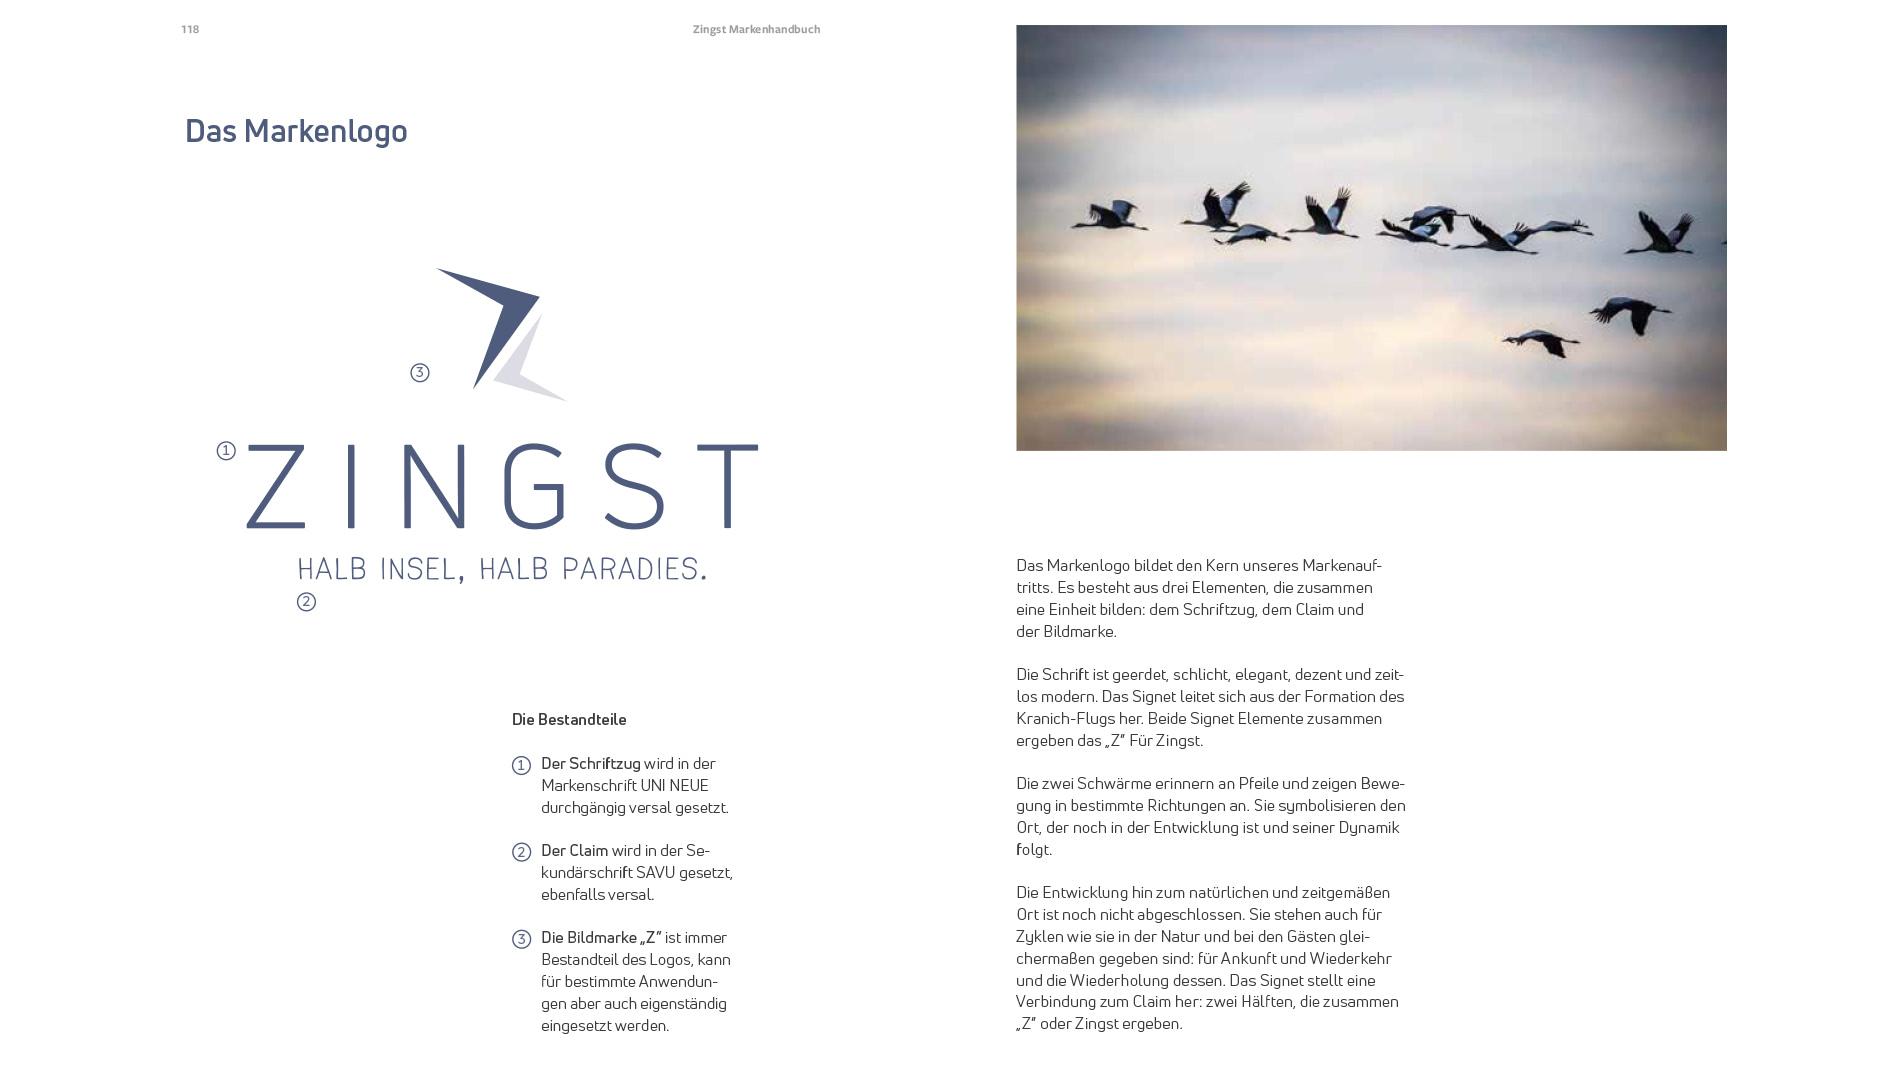 Markenentwicklung Corporate Design Zingst Markenlogo Vögel Going Places